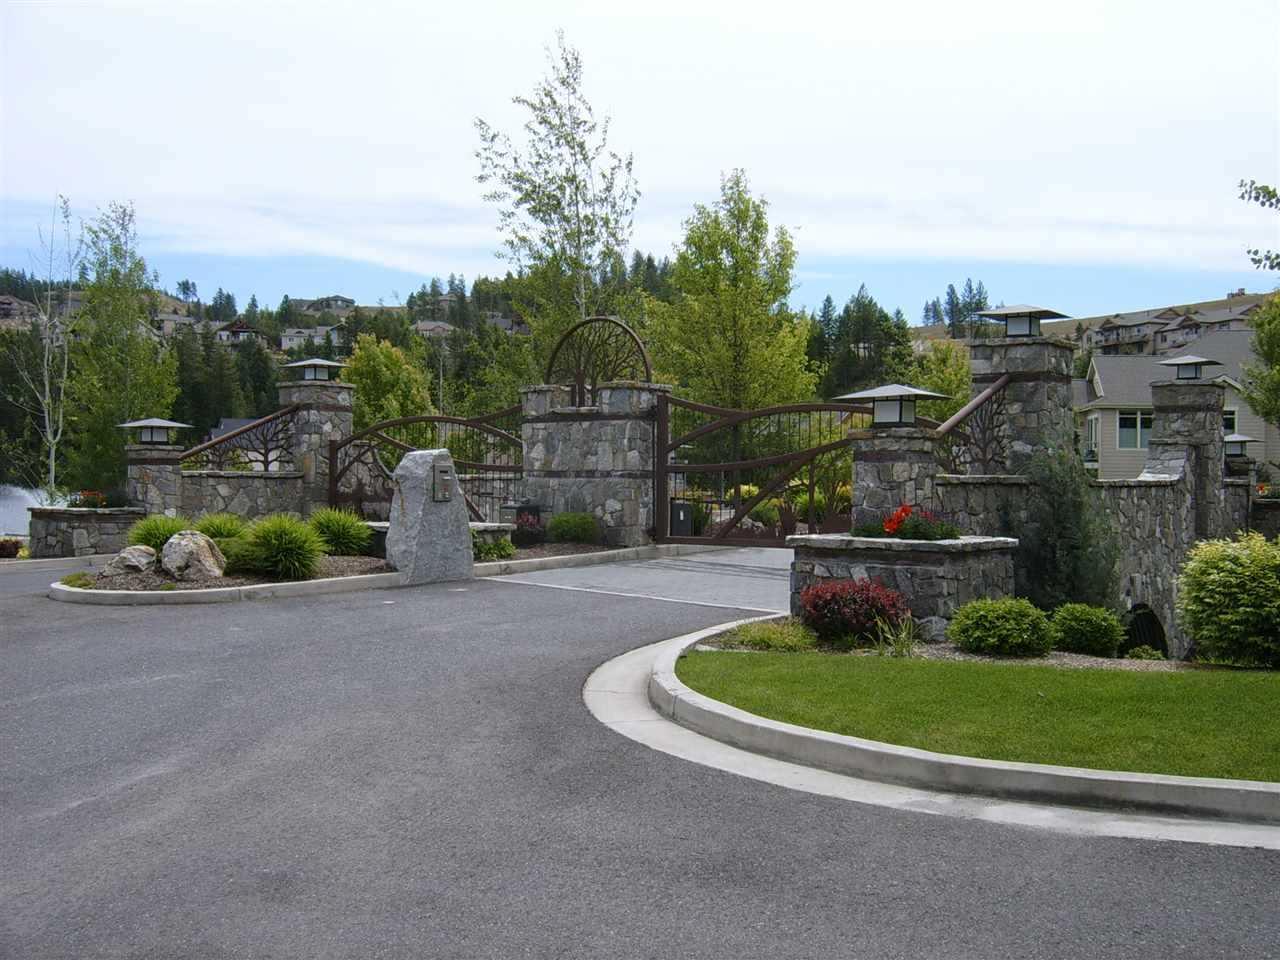 13514 Golf View Ln - Photo 1